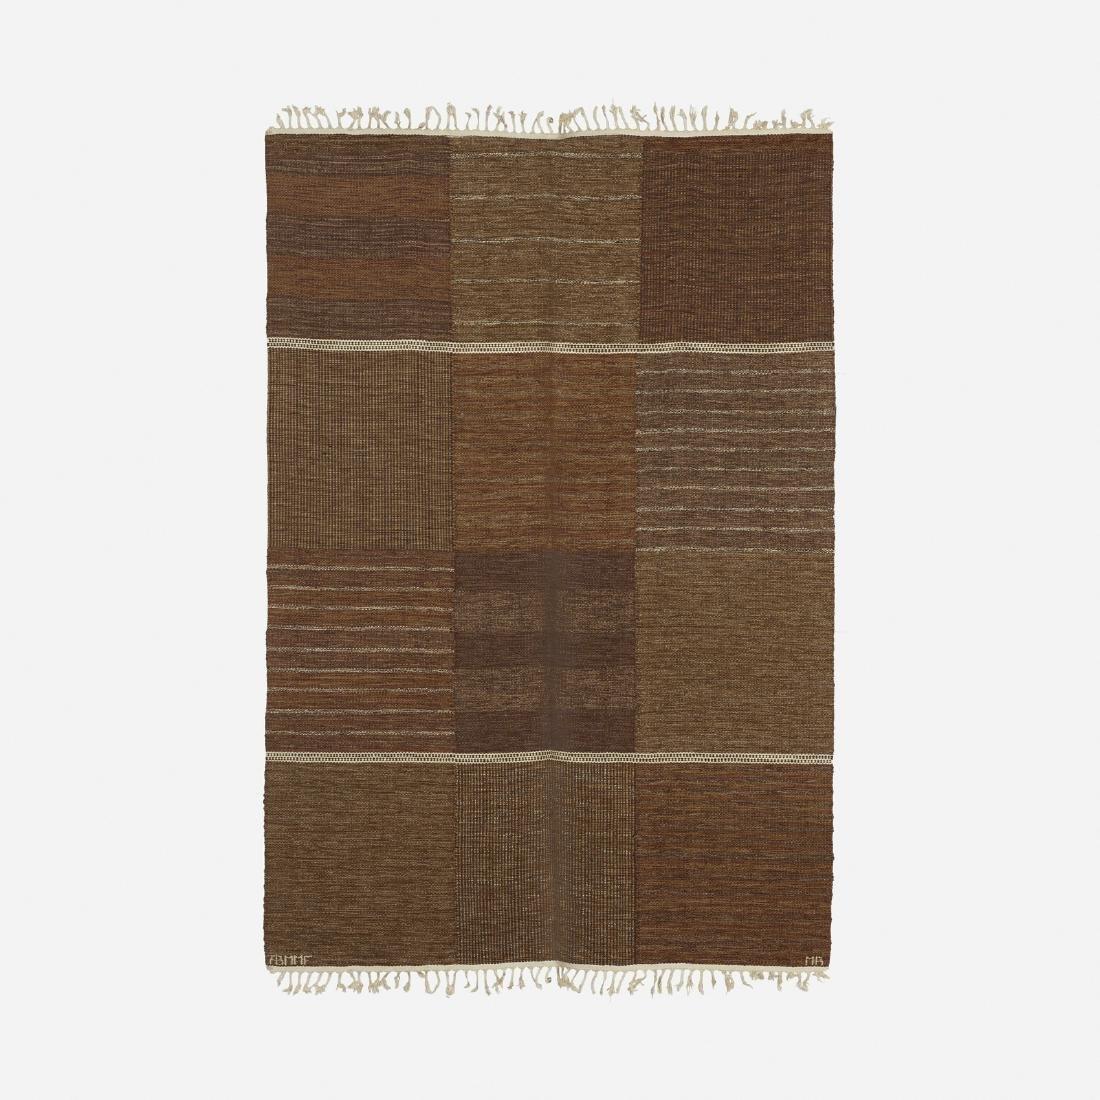 Marianne Richter, Tolv Rutor flatweave carpet